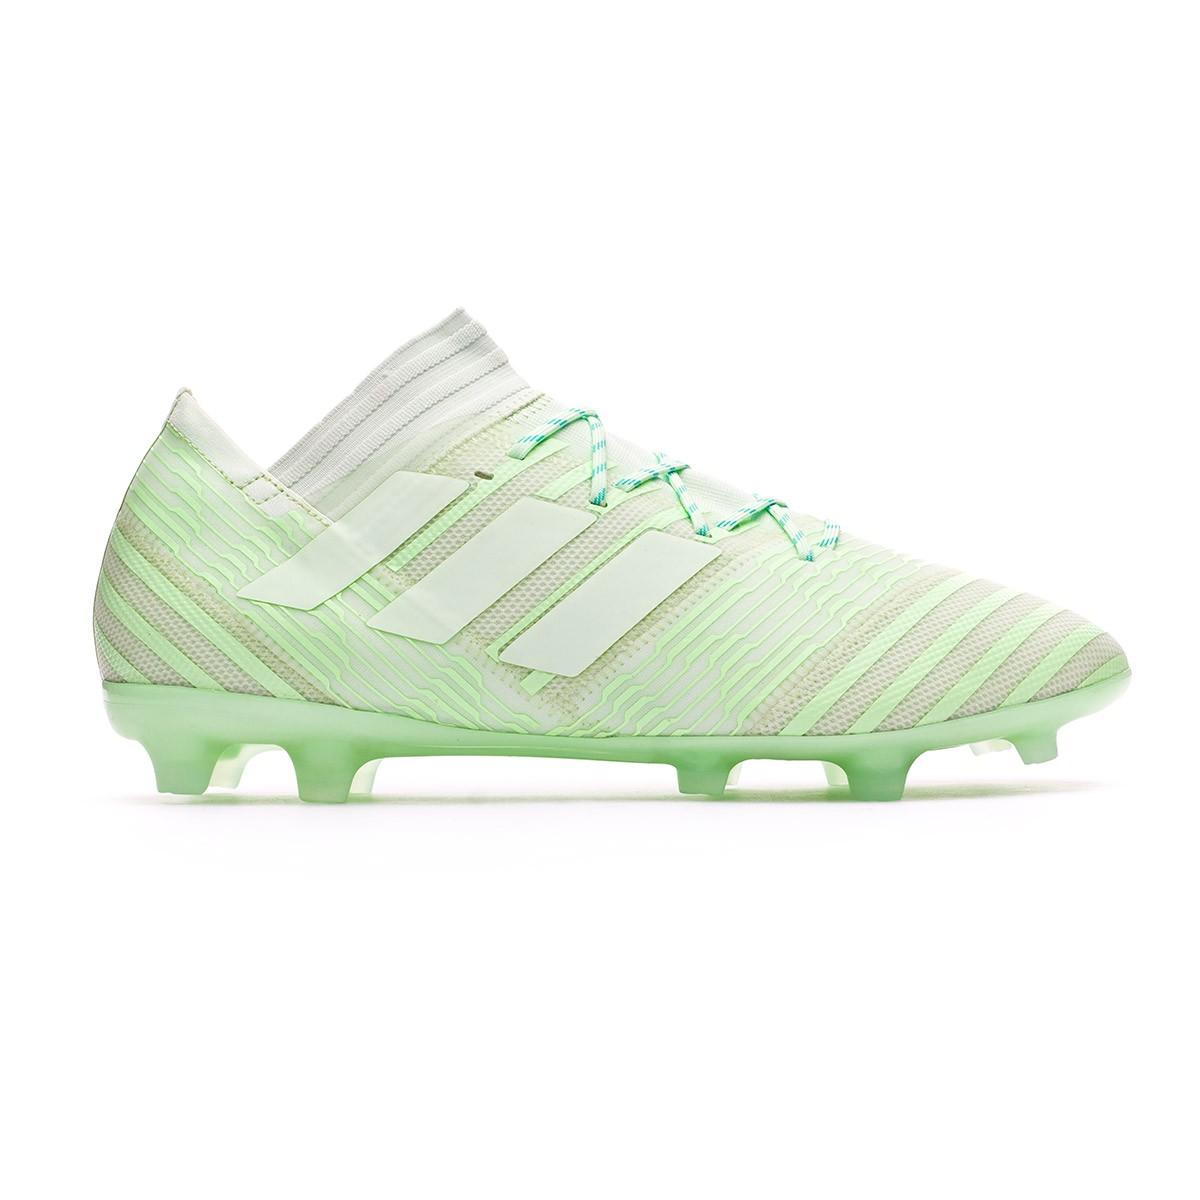 01e5cf4c1a Chuteira adidas Nemeziz 17.2 FG Aero green-Hi-res green - Loja de futebol  Fútbol Emotion